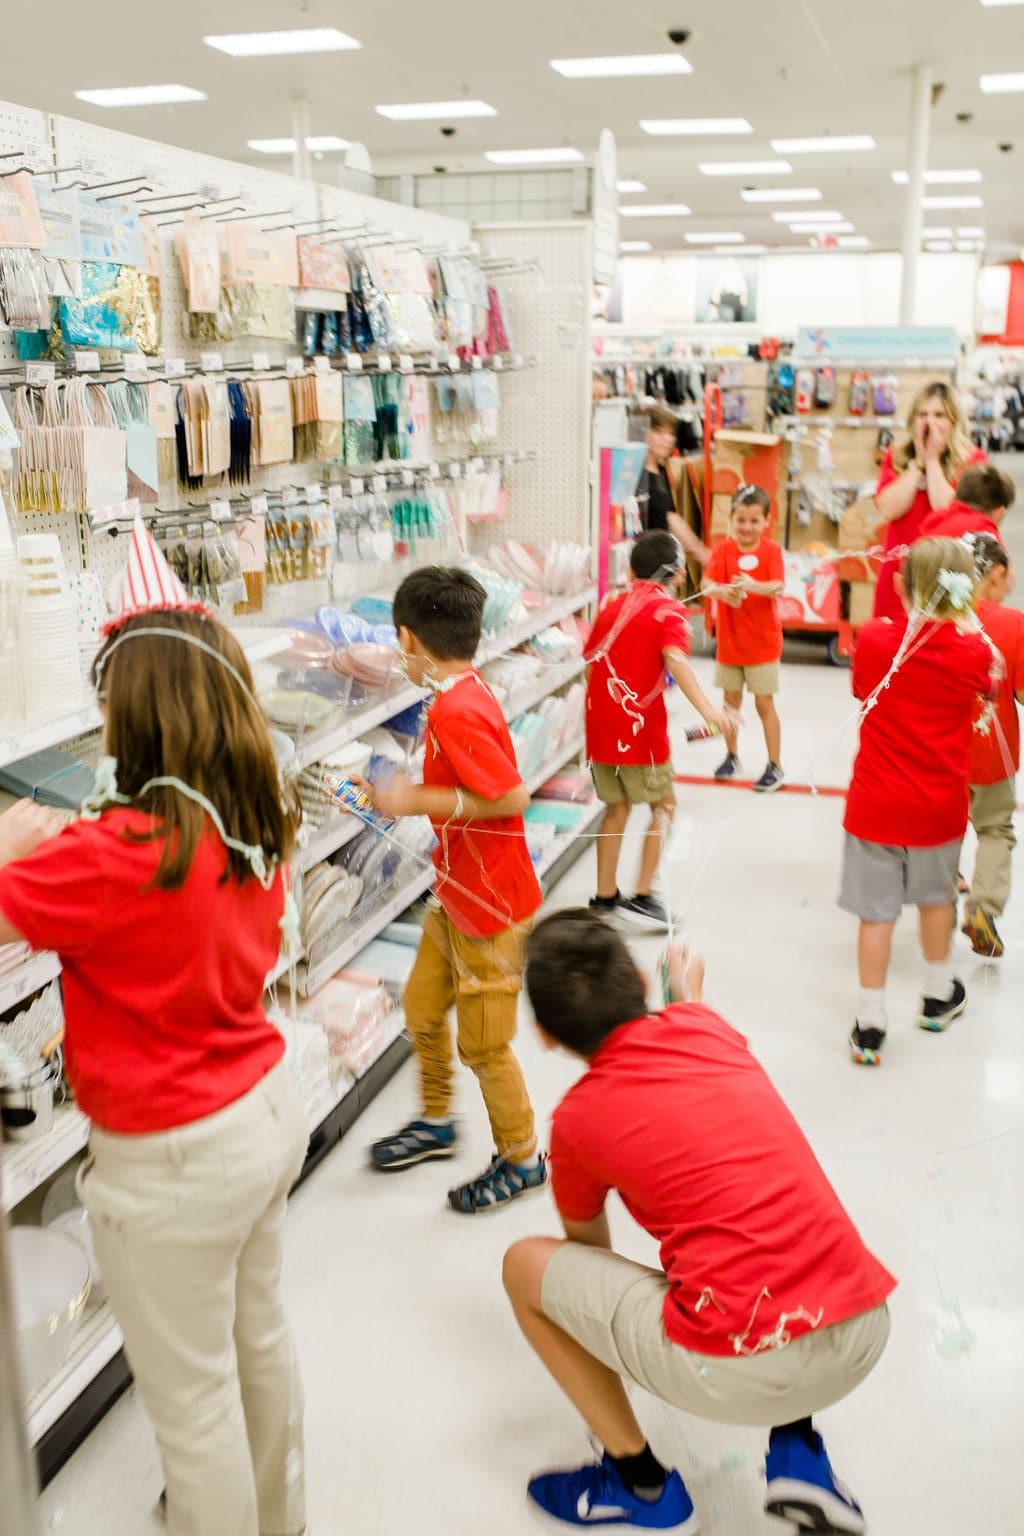 kids in an aisle